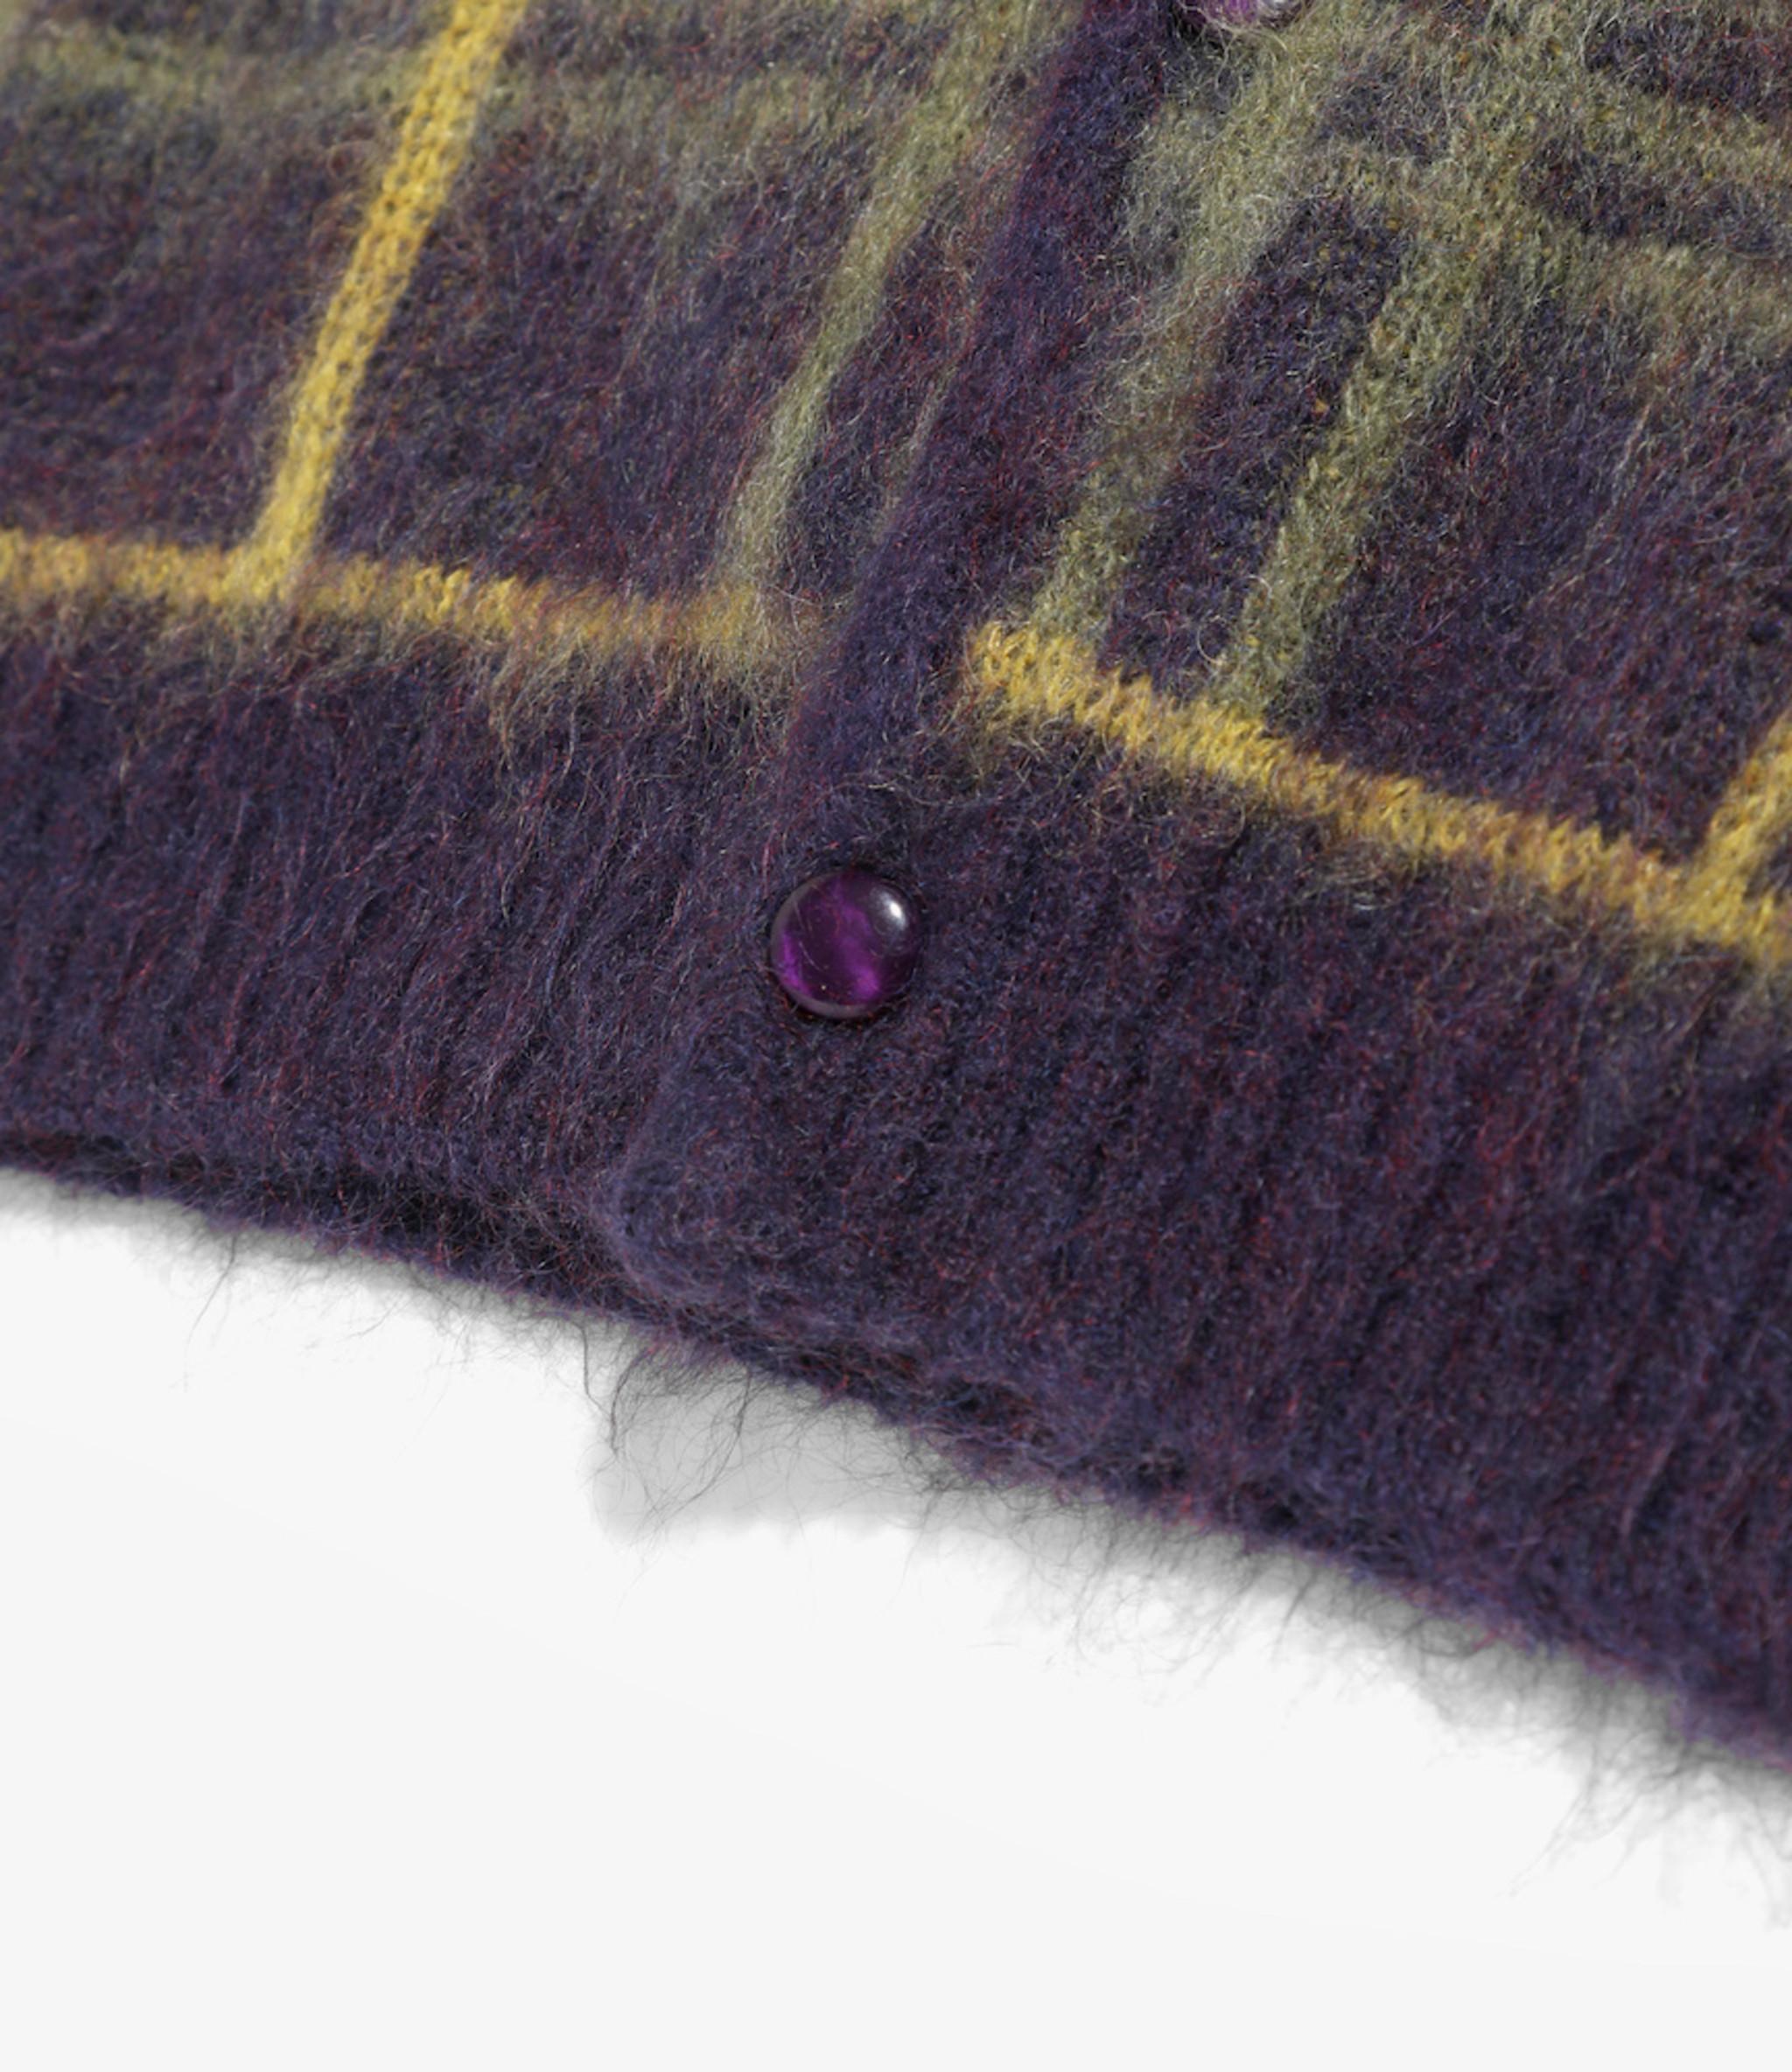 Needles Mohair Cardigan - Plaid